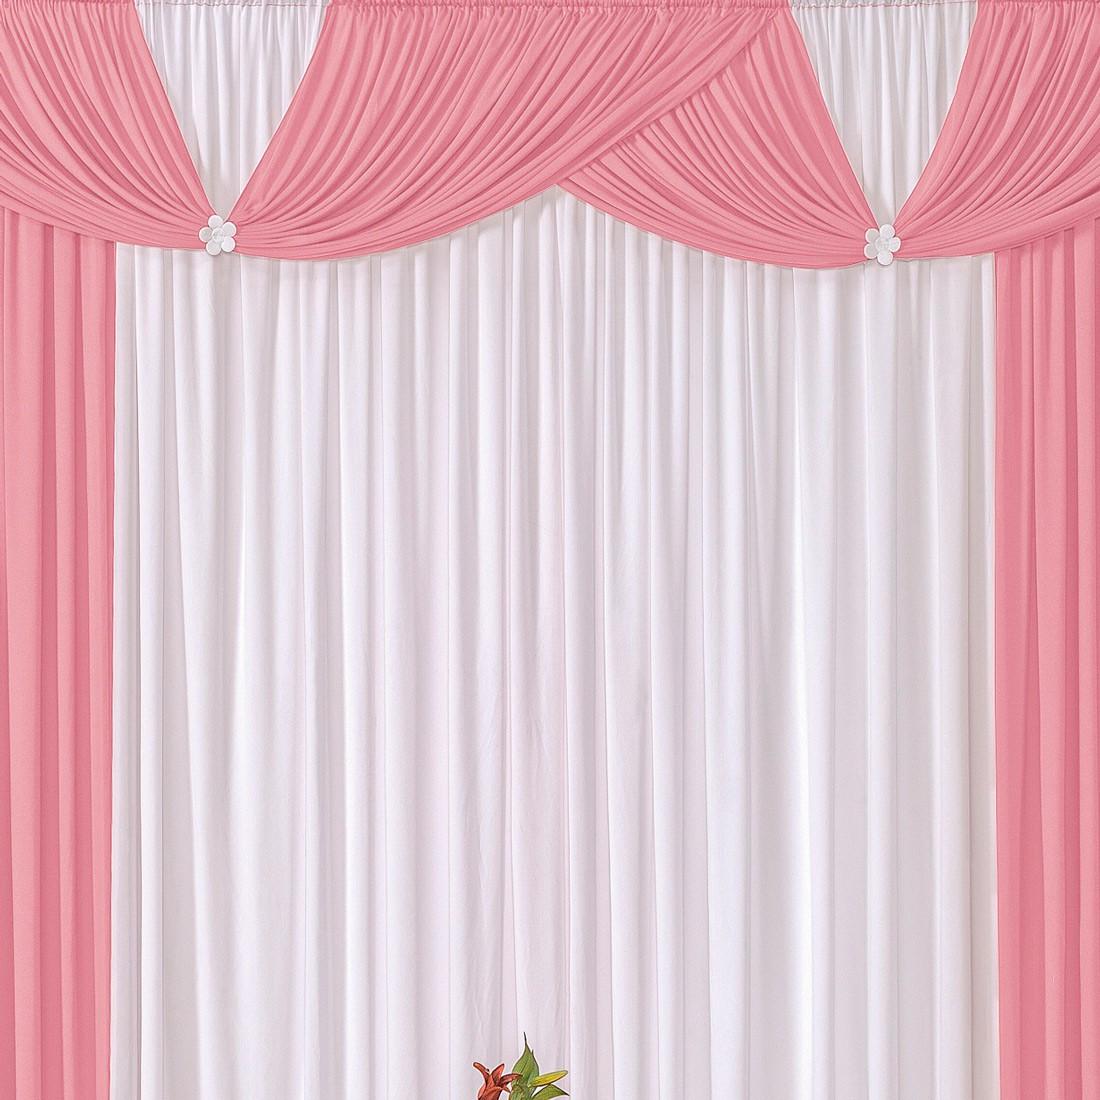 Cortina Londrina Rosa/Branco 4,00m X 2,60m p/ Varão Simples